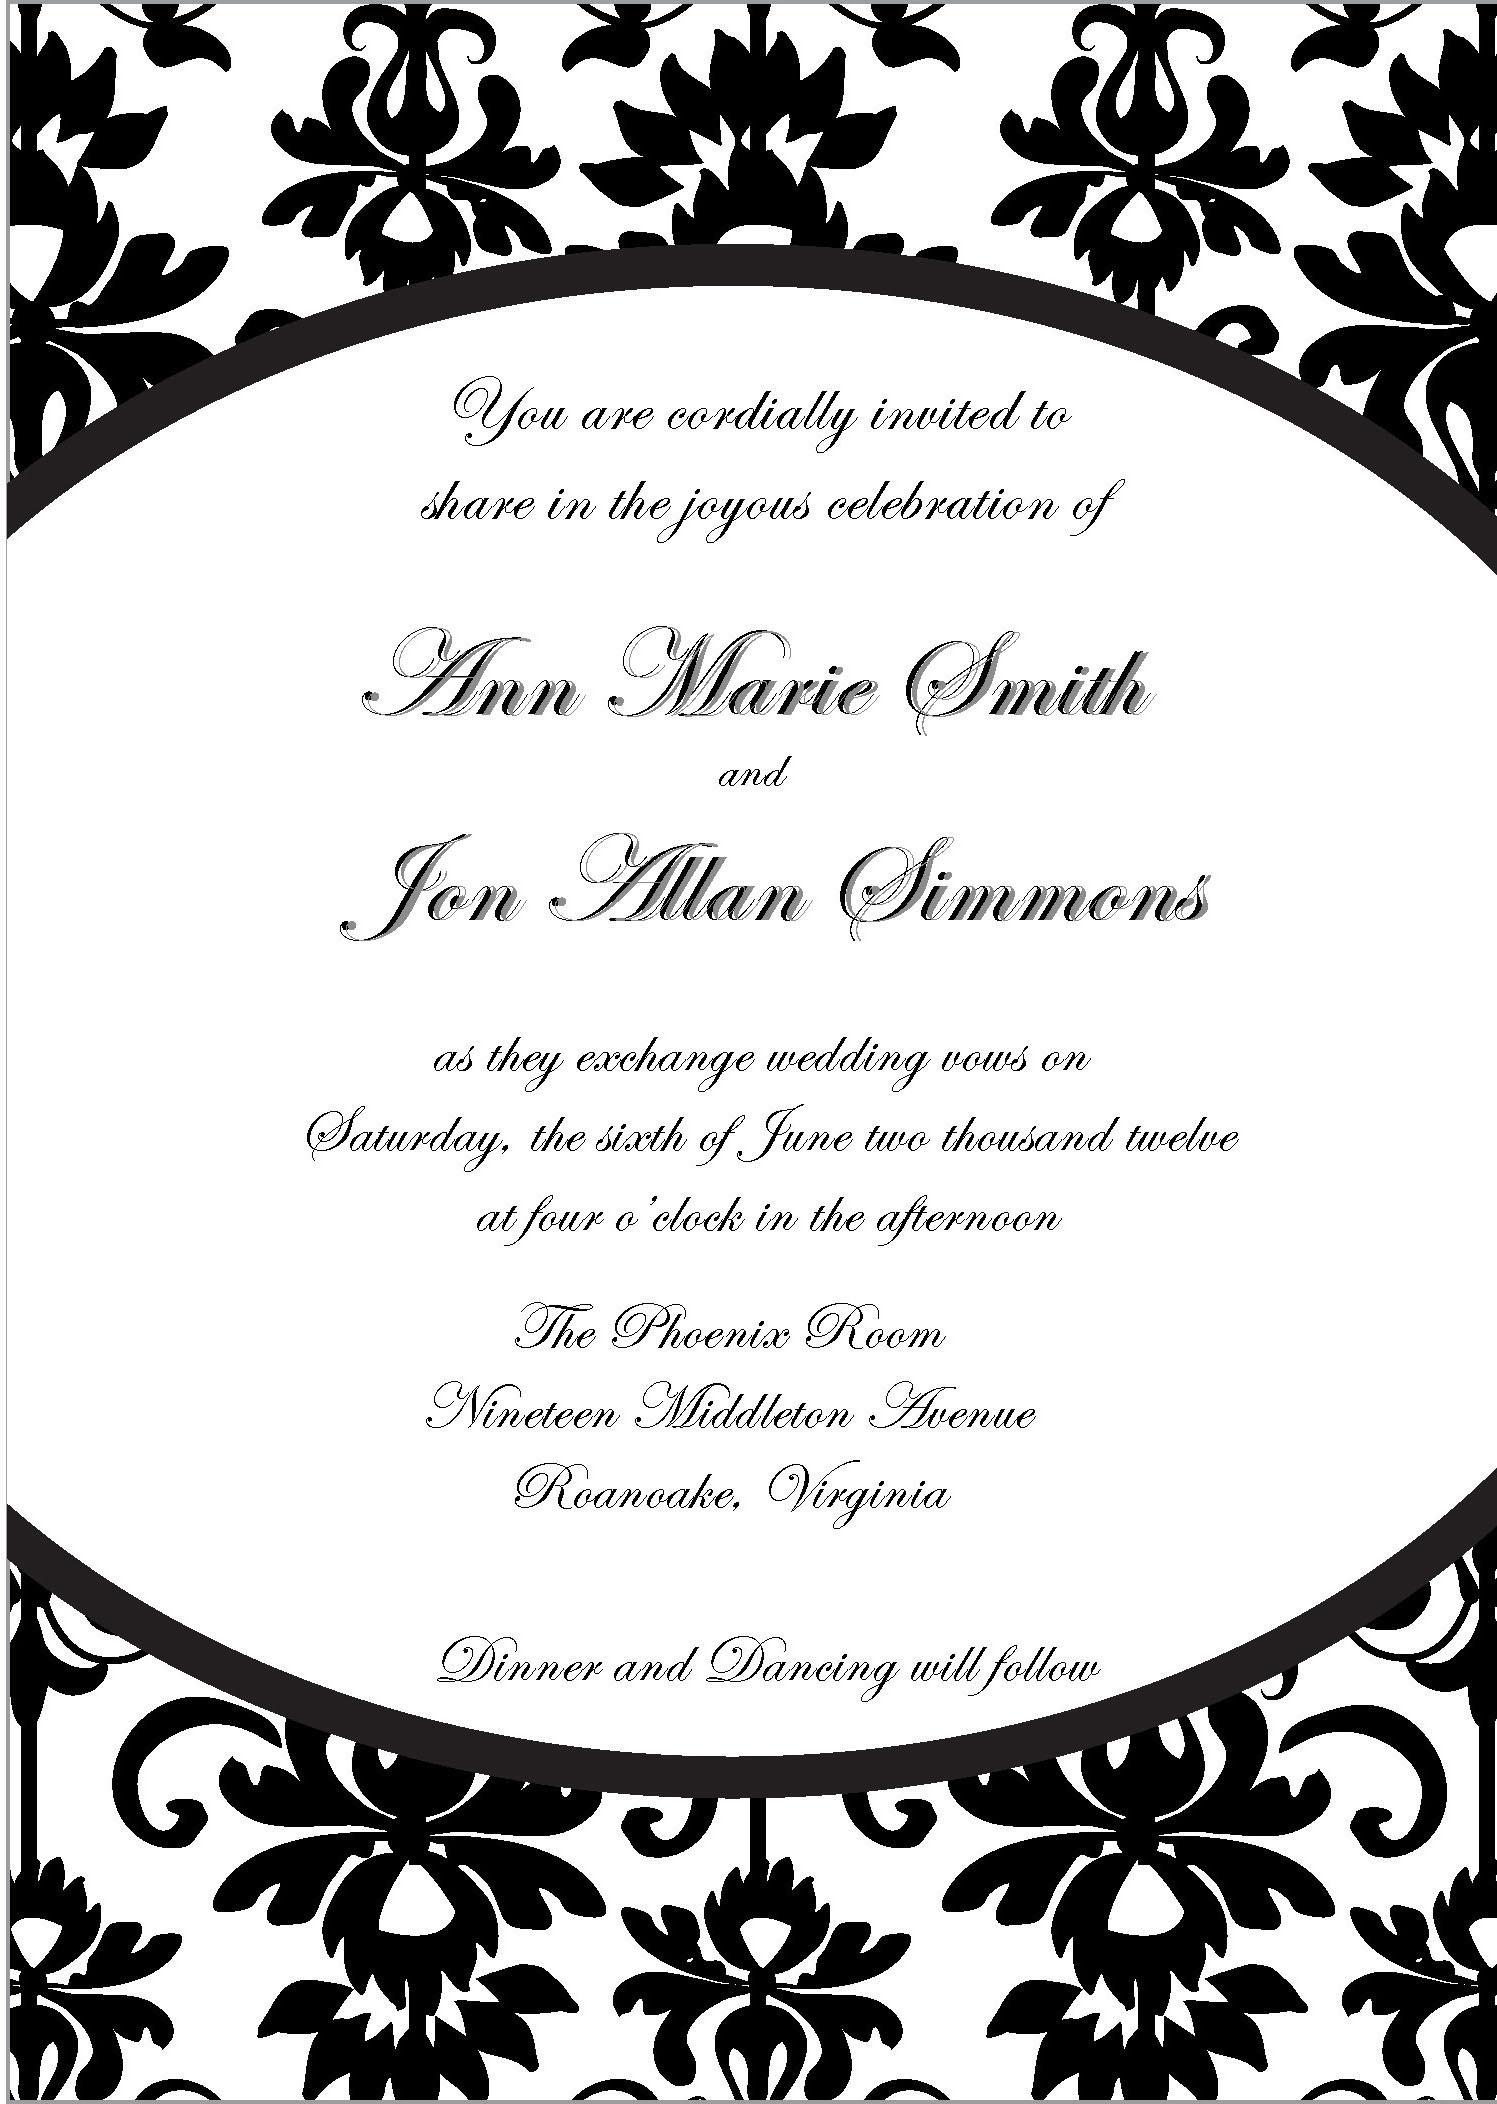 Photo : Printable Bridal Shower Invitation Image - Free Printable Black And White Baby Shower Invitations